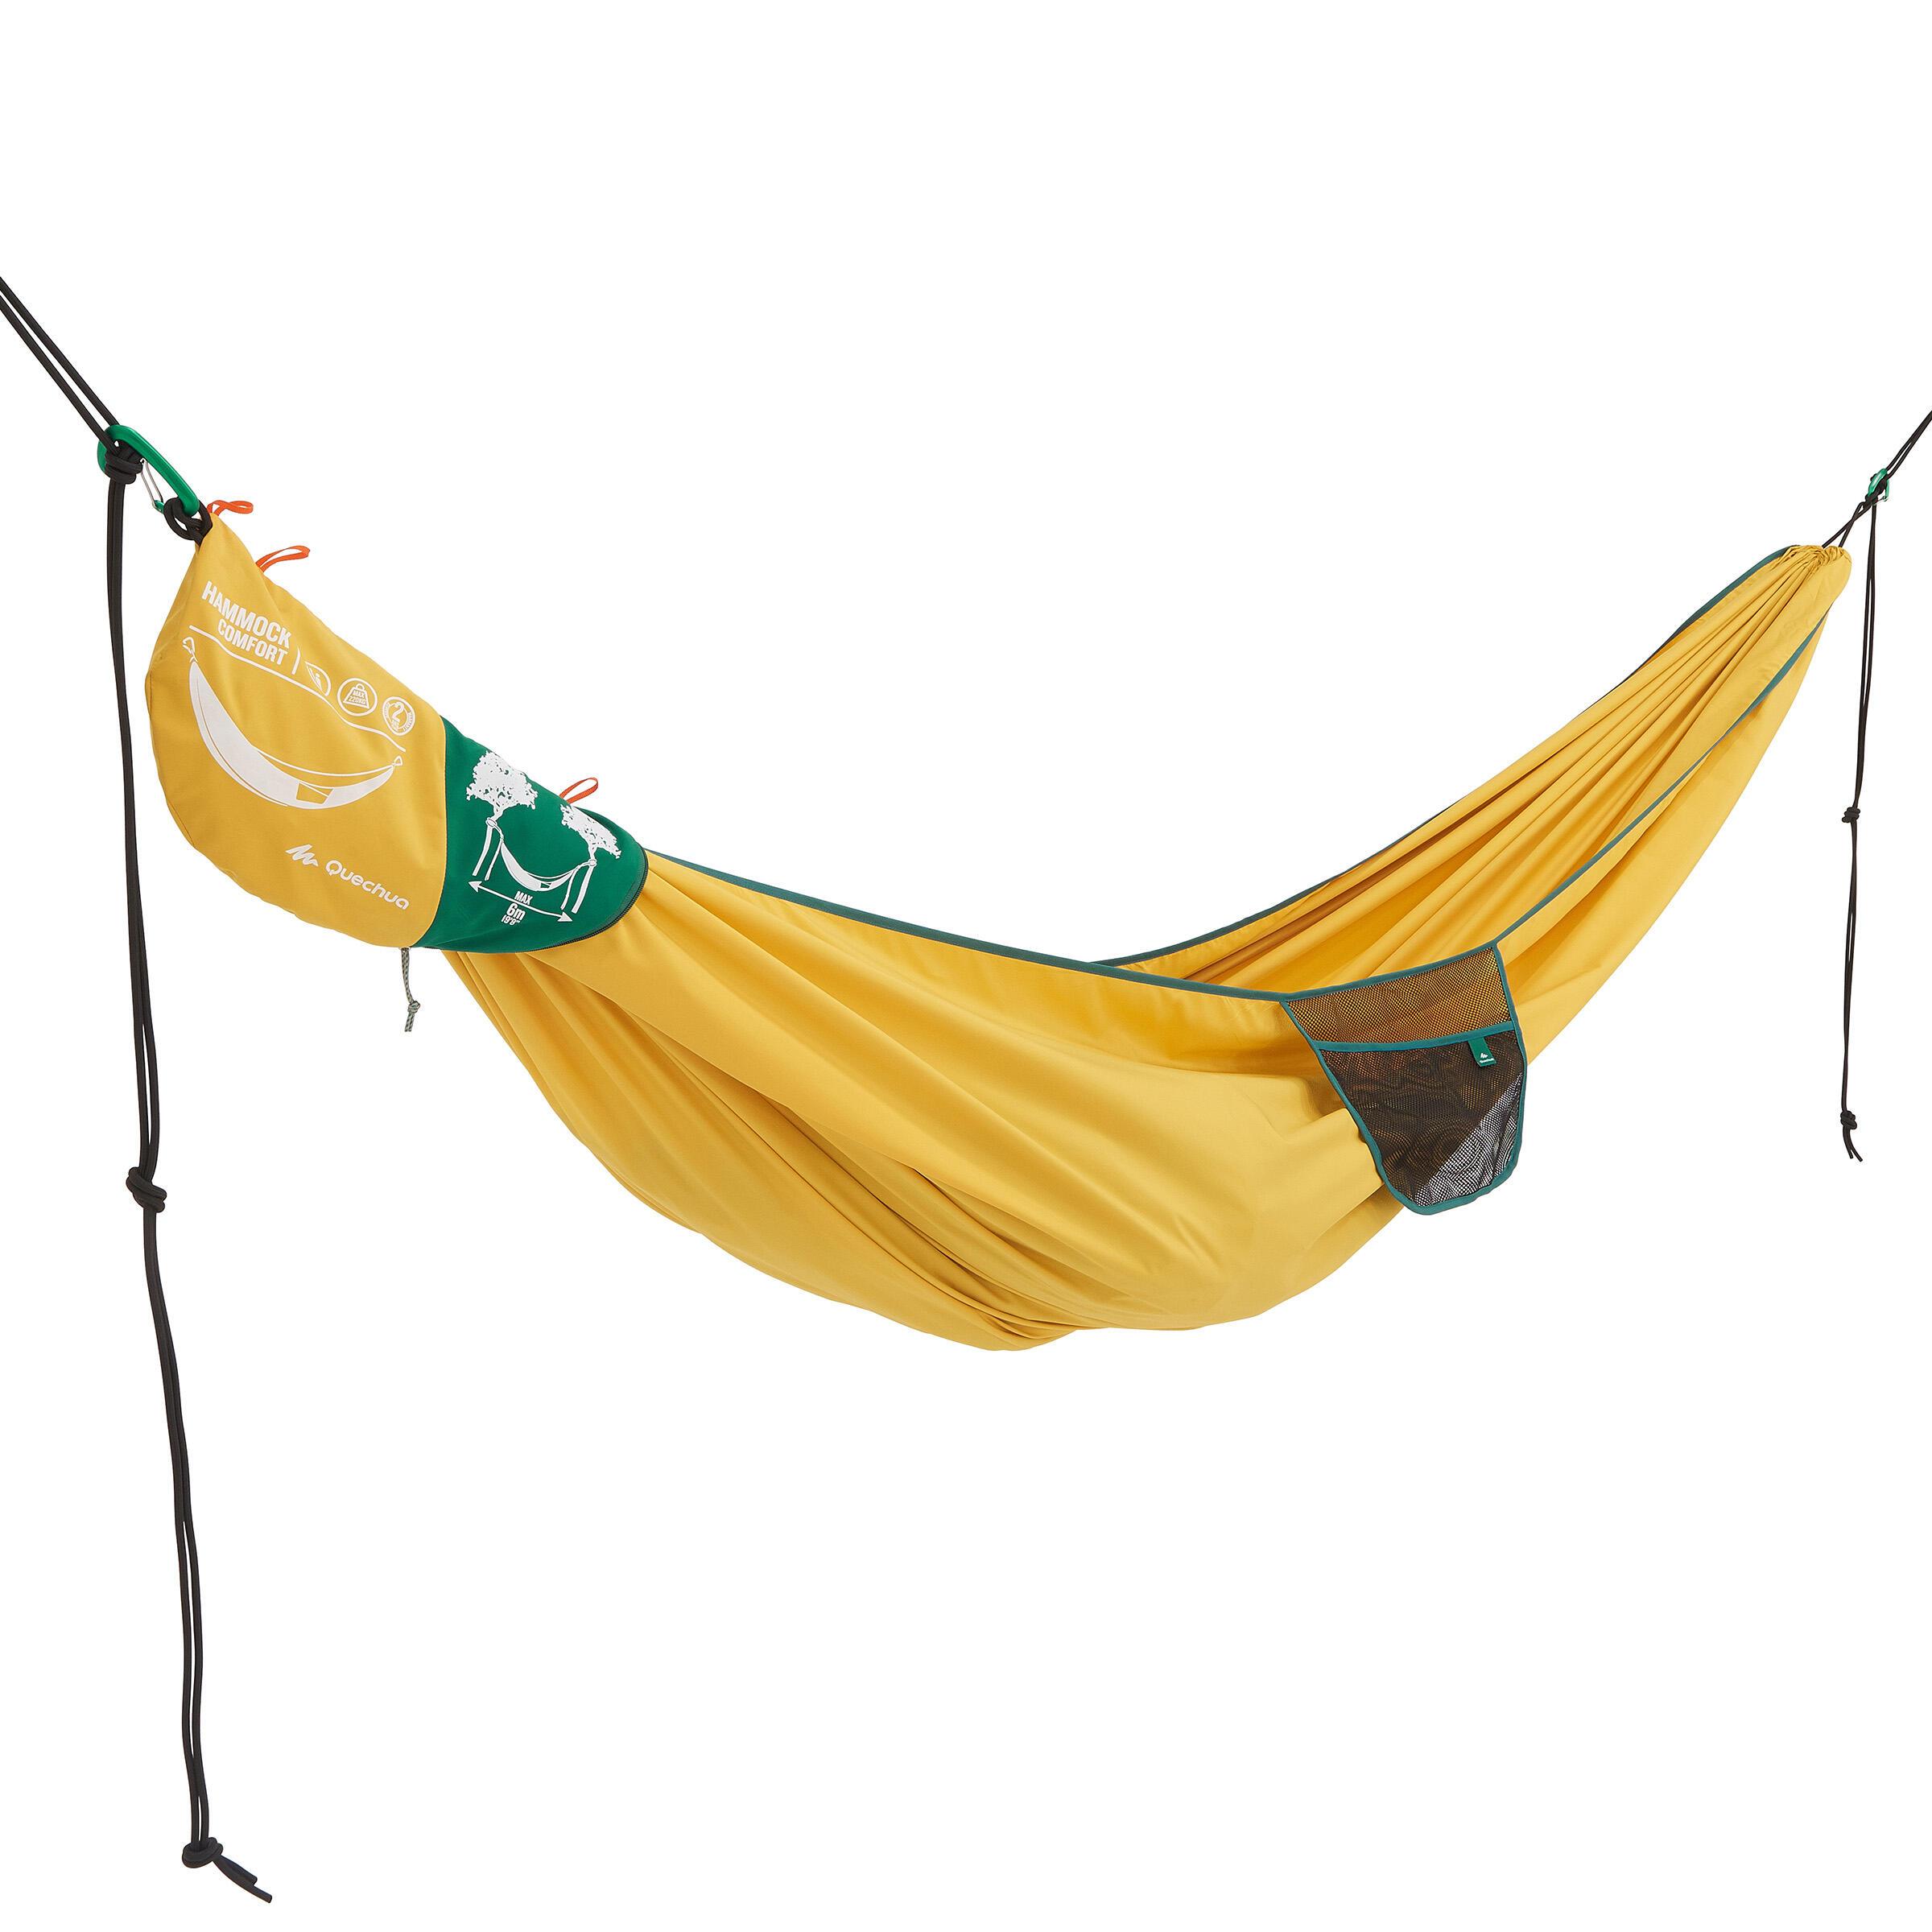 Quechua Hangmat Comfort 2 personen